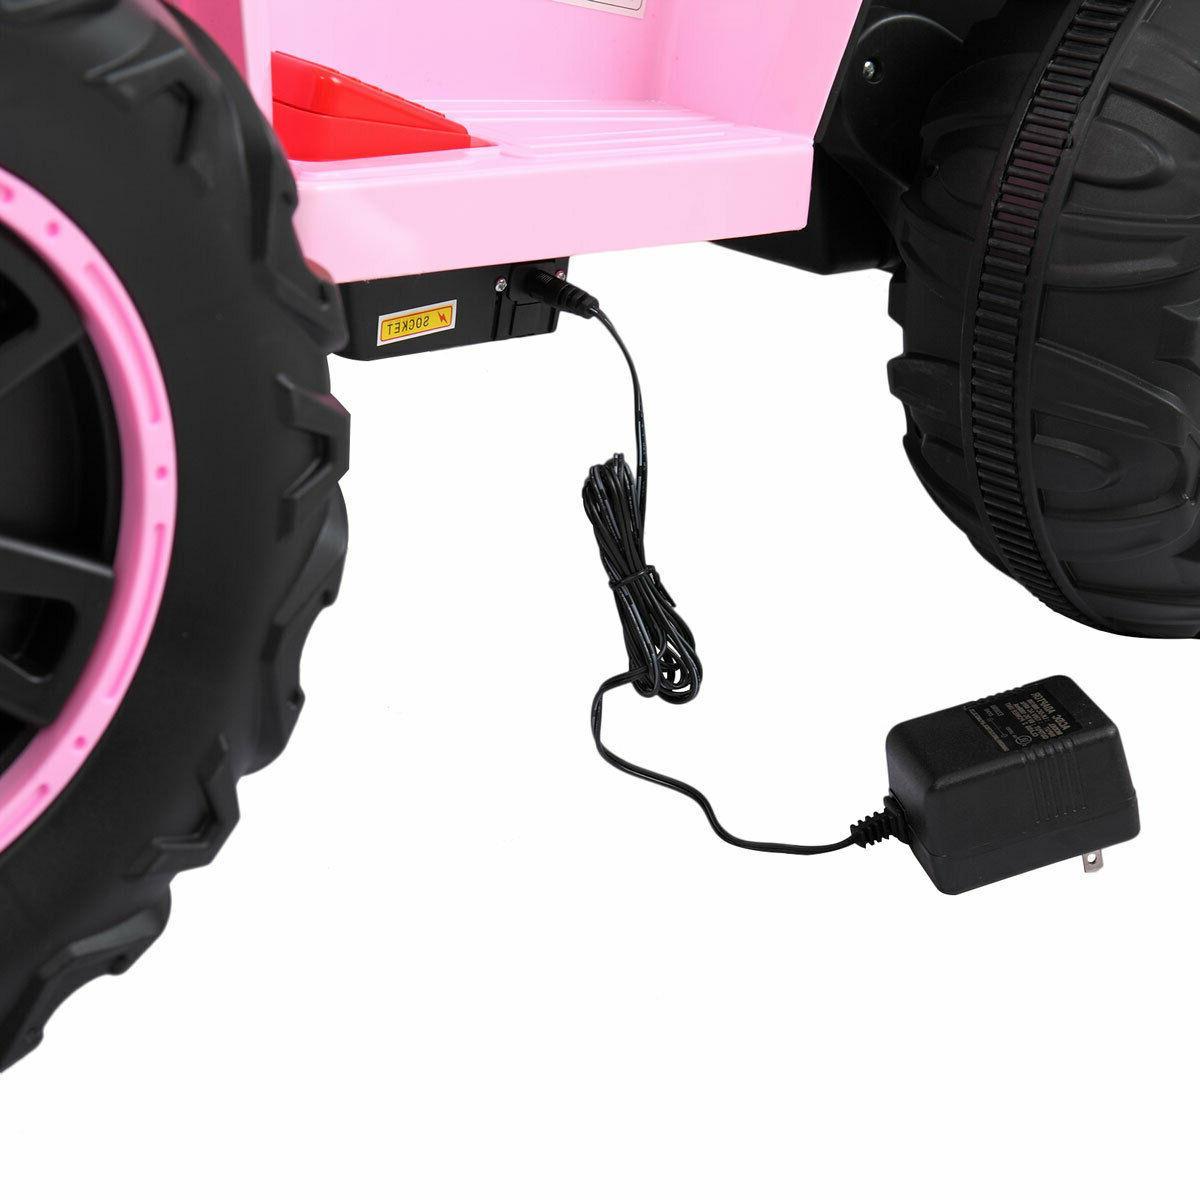 Kids Ride Car 6V Wheels 2 Speed MP3 LED Light Toy